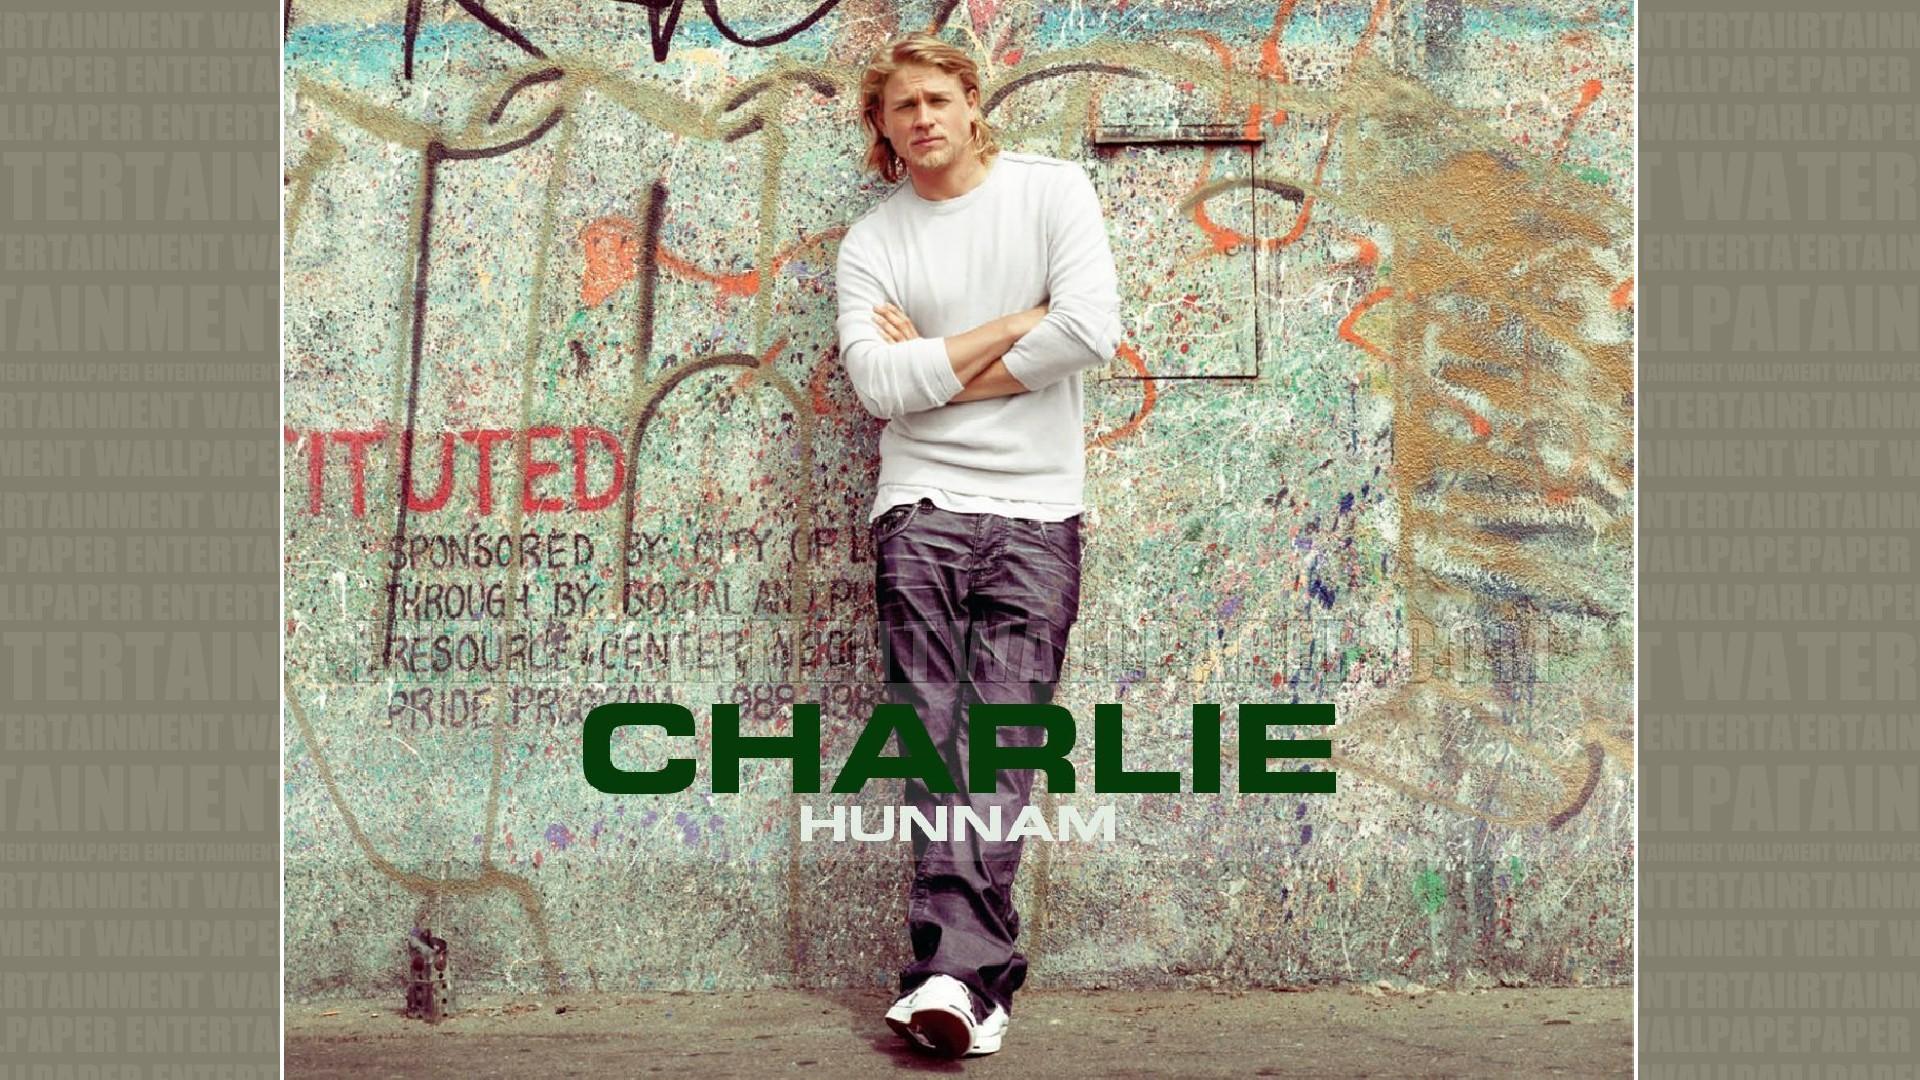 Free Hd Wallpaper Download Charlie Hunnam Wallpaper Hd: Charlie Hunnam Wallpaper ·①